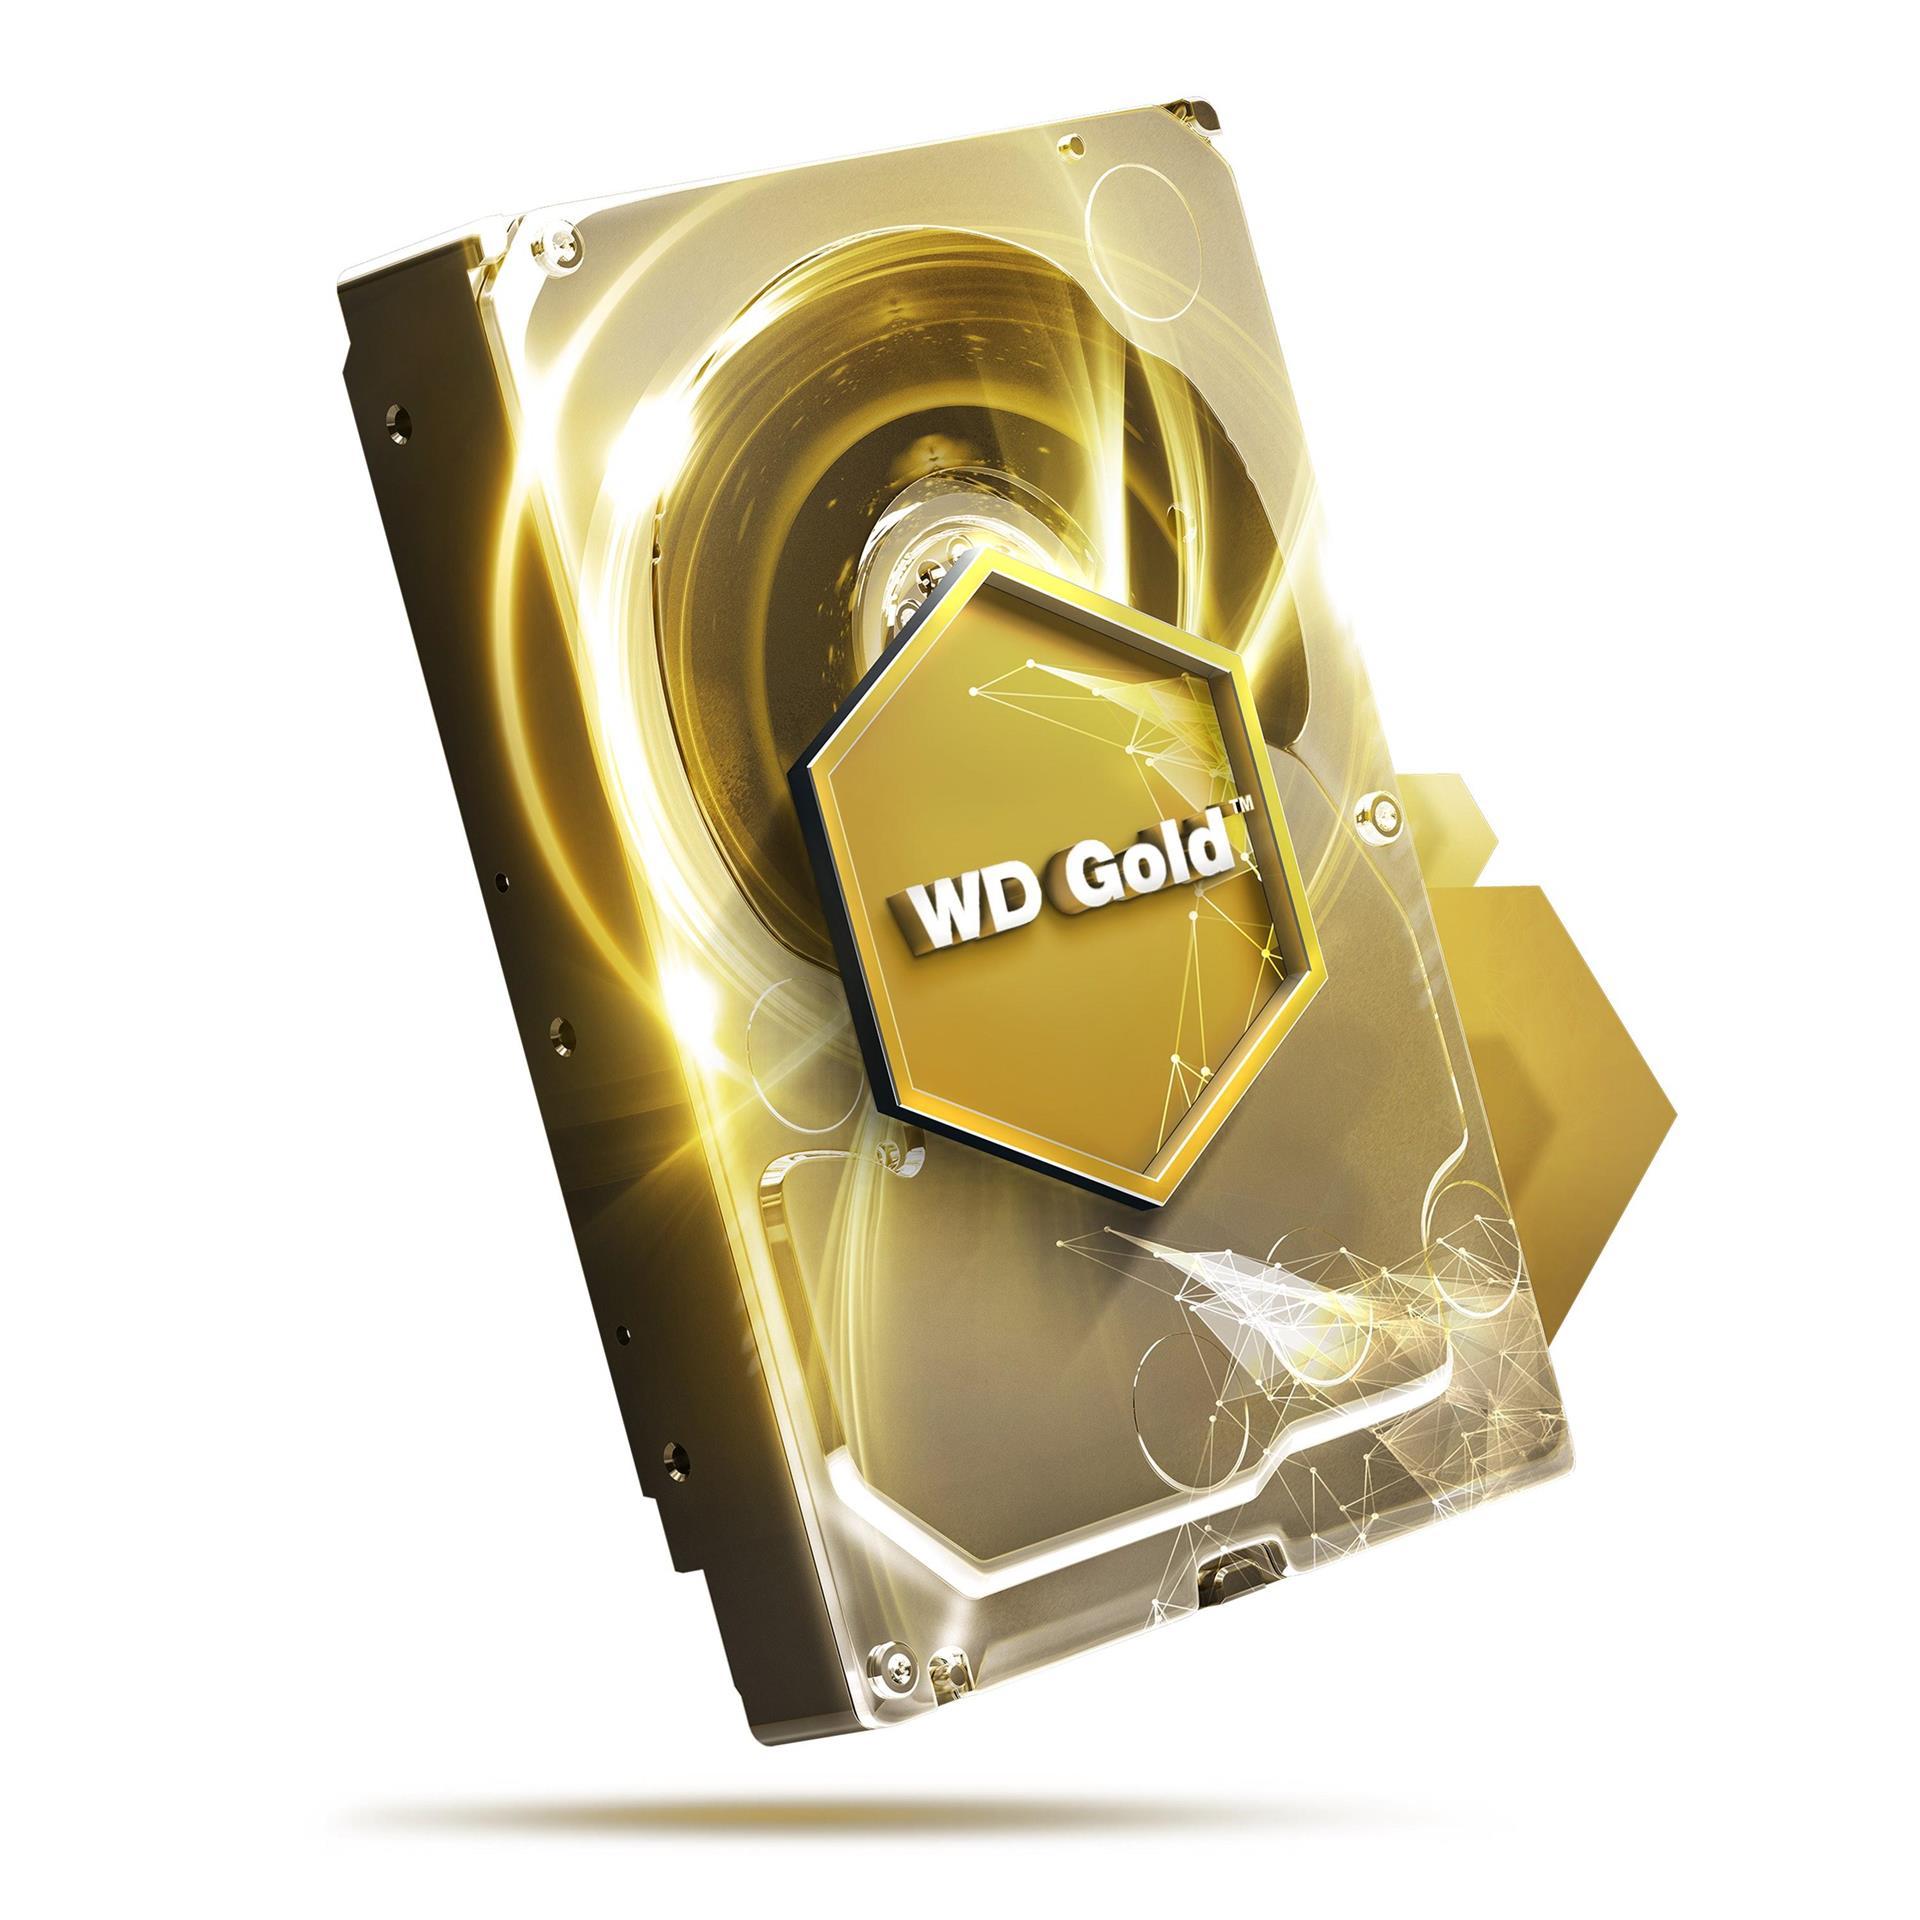 1000GB WD Gold, SATA 6Gb/s (WD1005FBYZ)